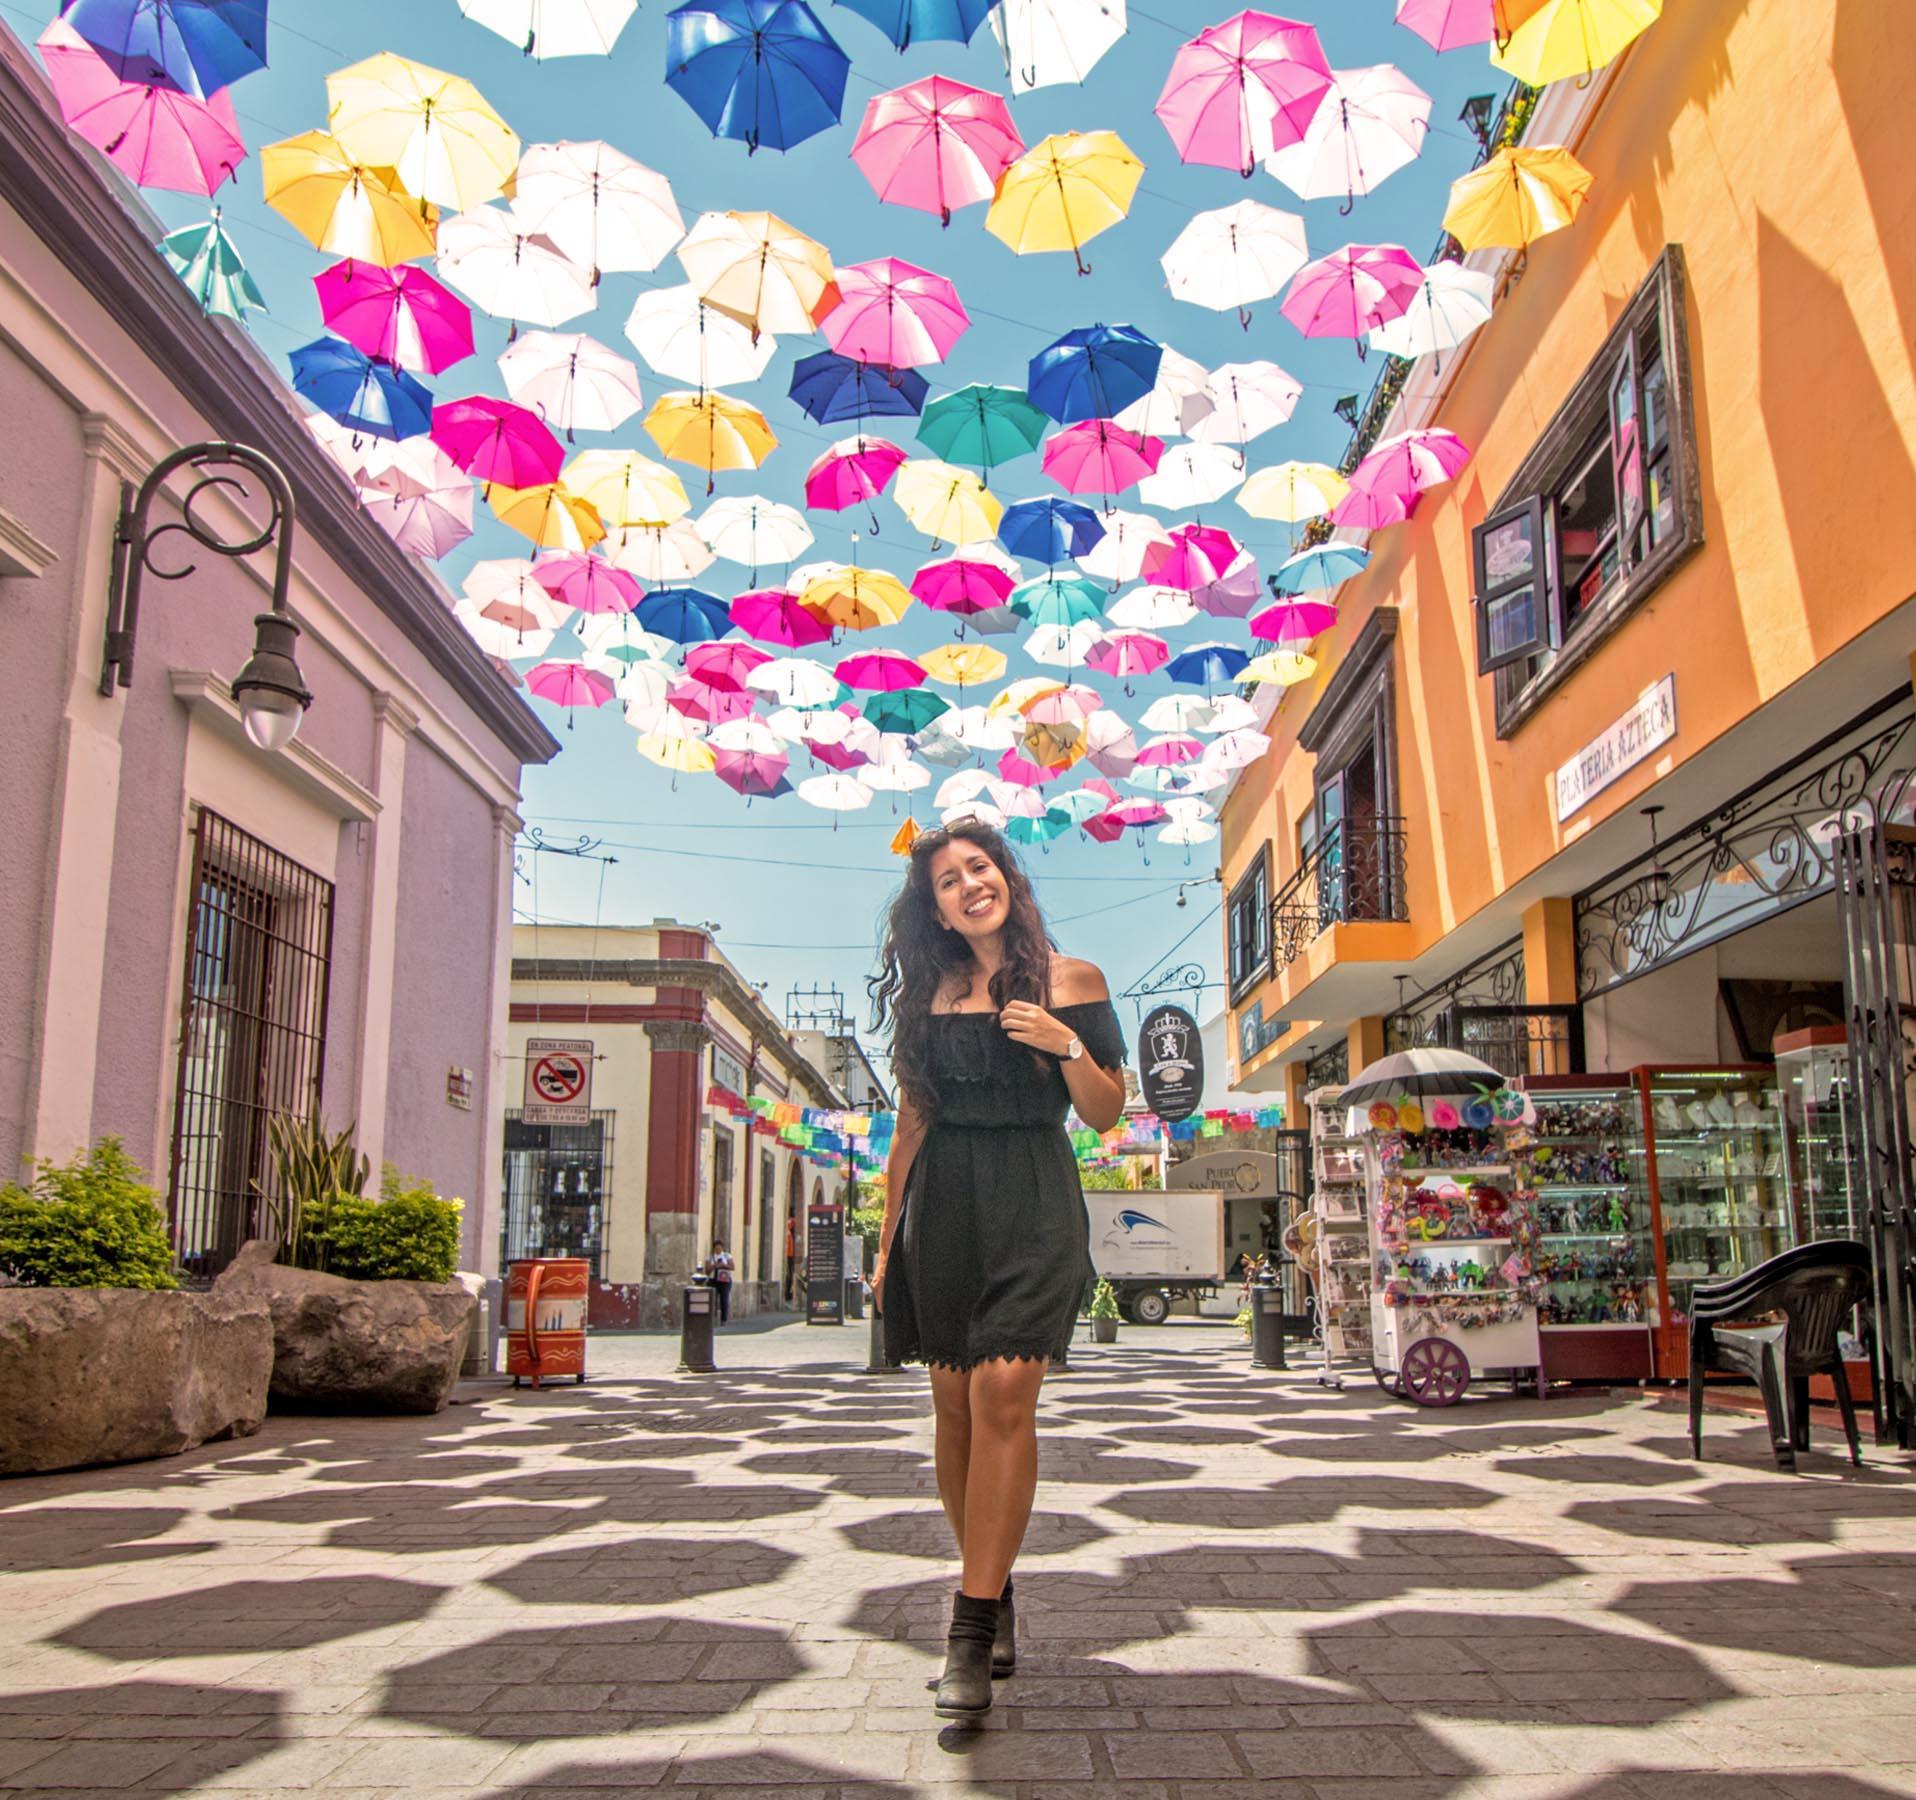 Umbrellas in Tlaquepaque, Jalisco